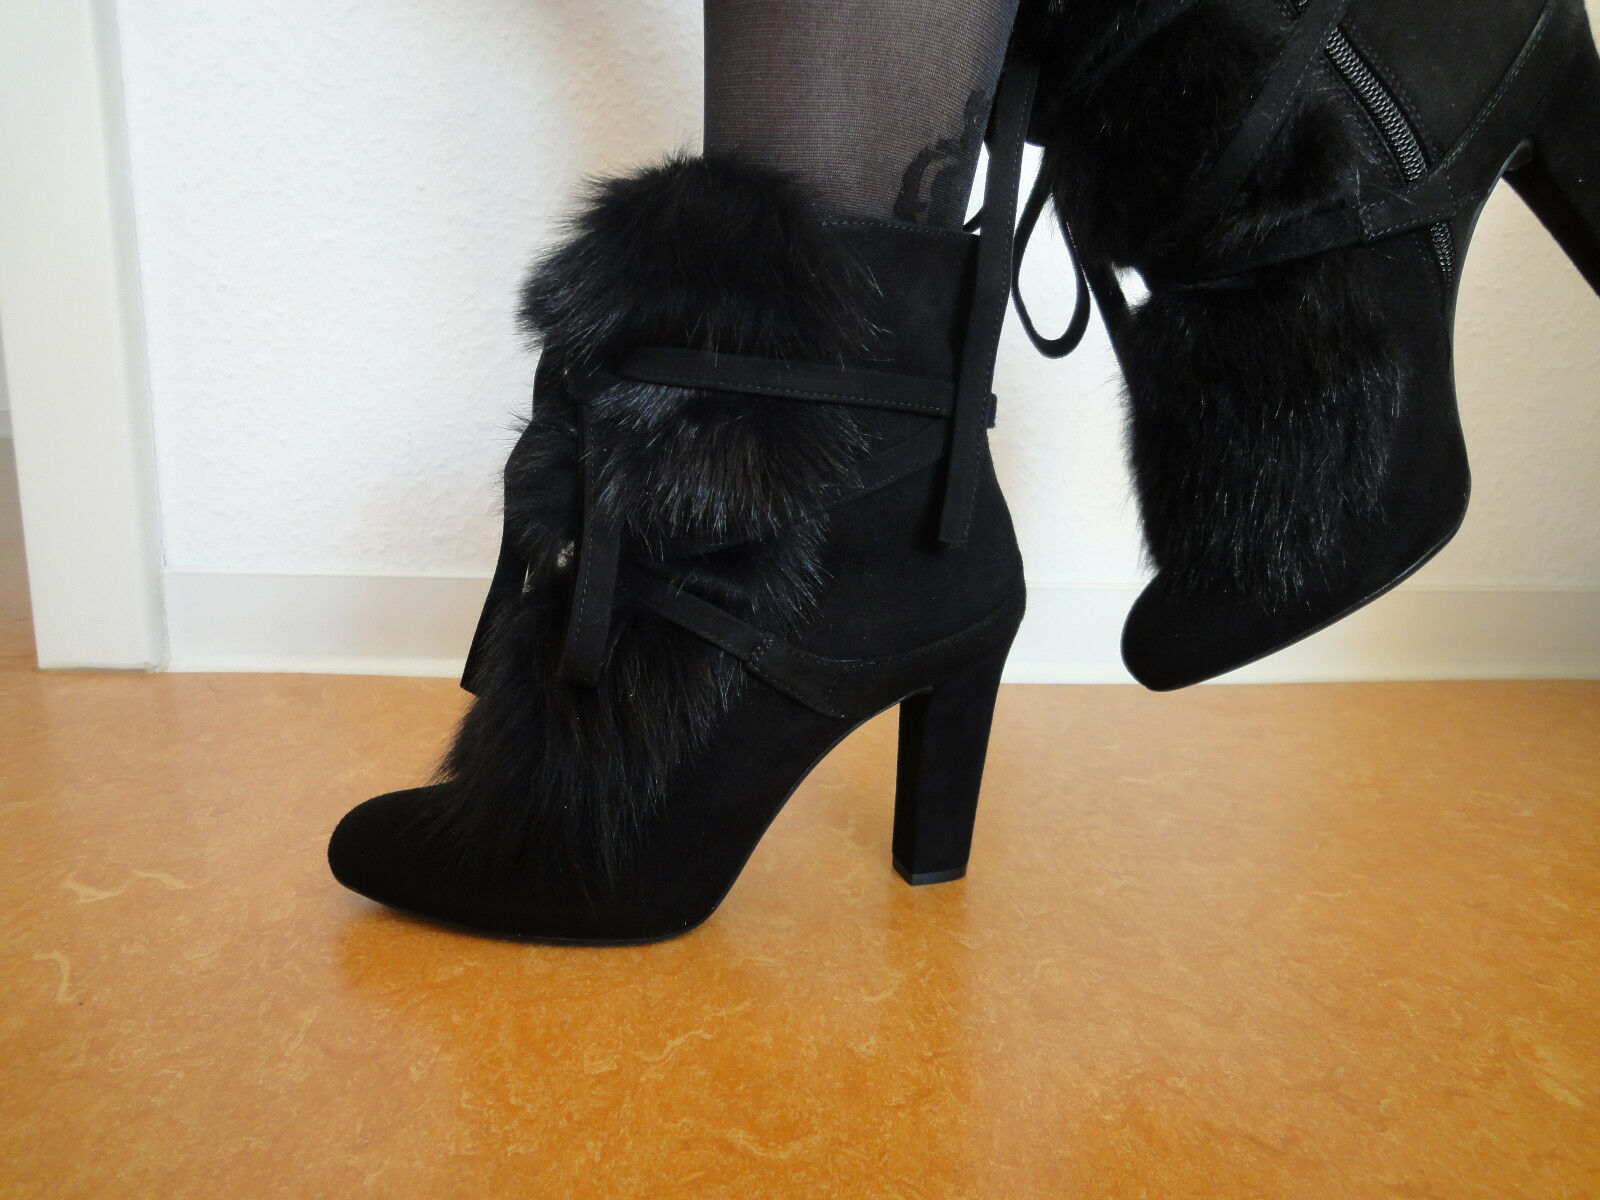 UNISA Damen Stiefel  Pomati_KS   Gr. 39 39 39 Stiefeletten Echtleder schwarz neu 6a54a8